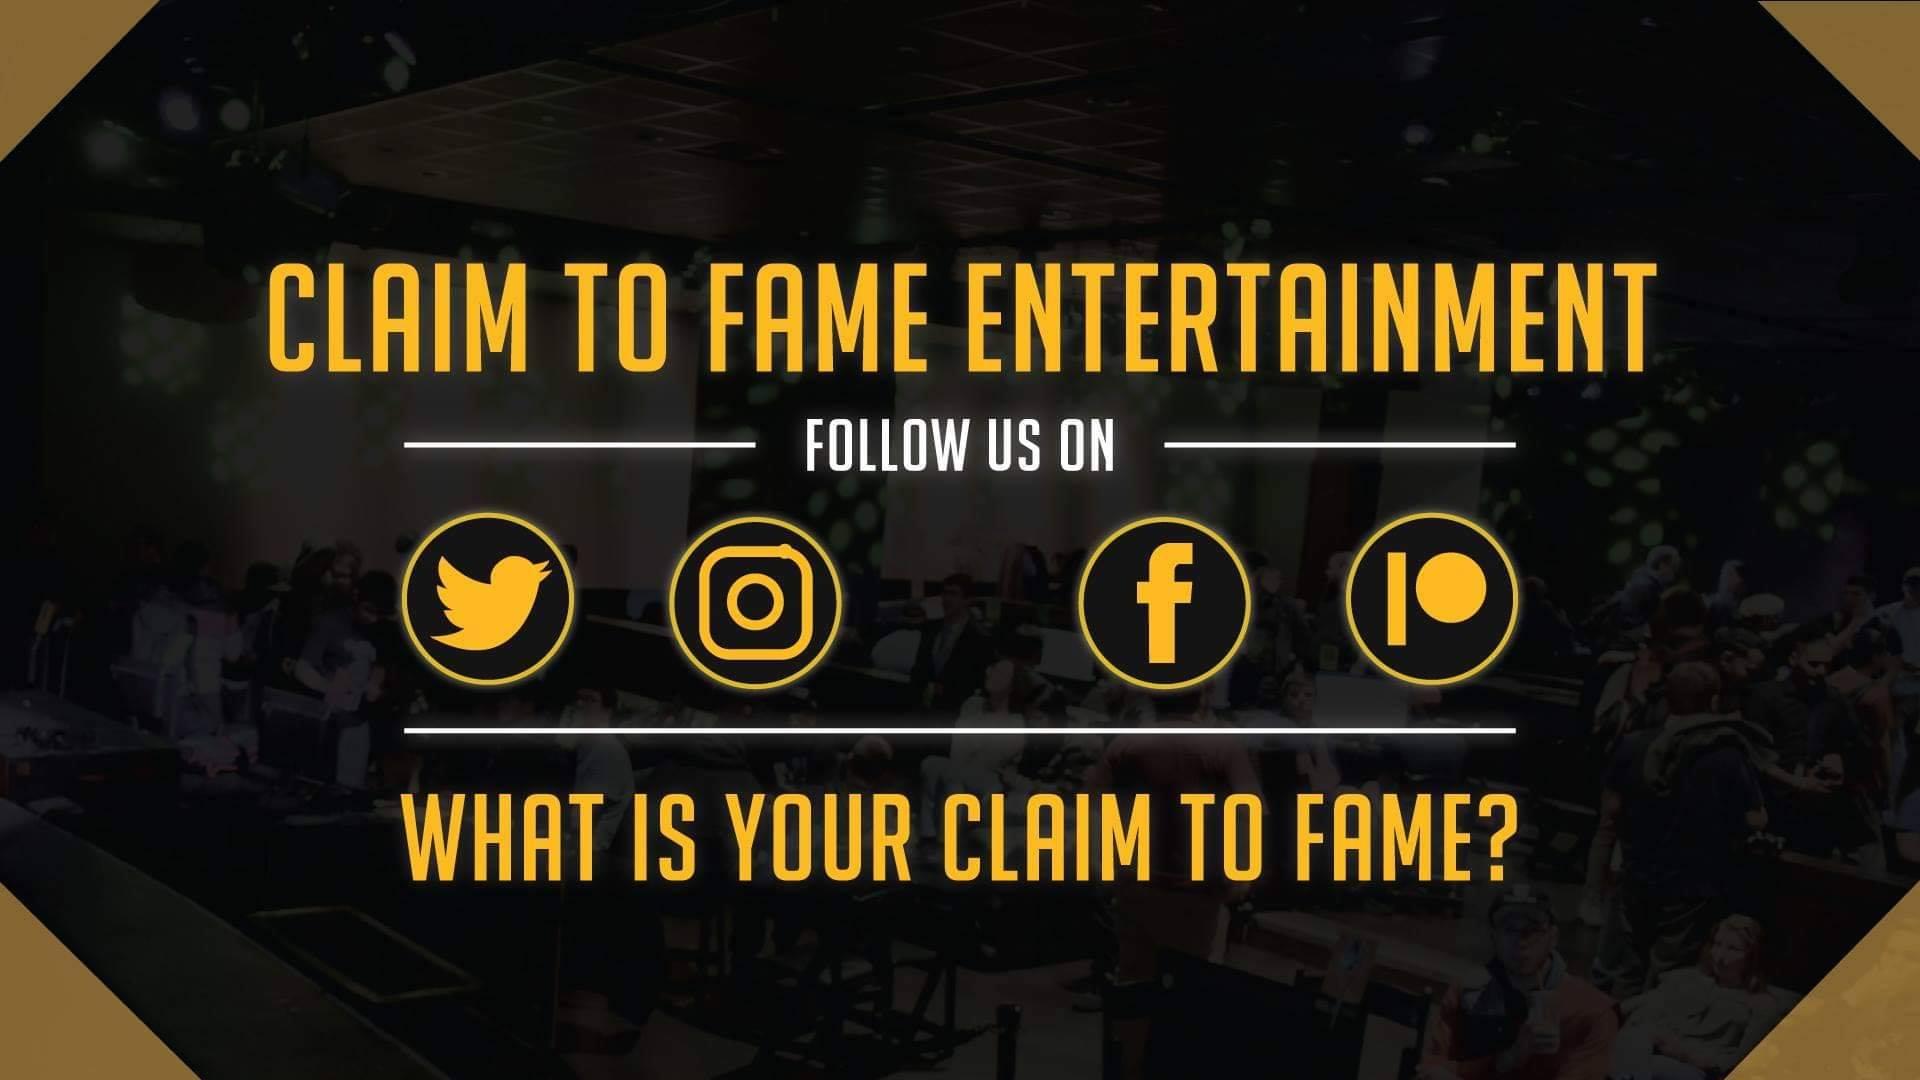 Claim to Fame Entertainment - Social Media